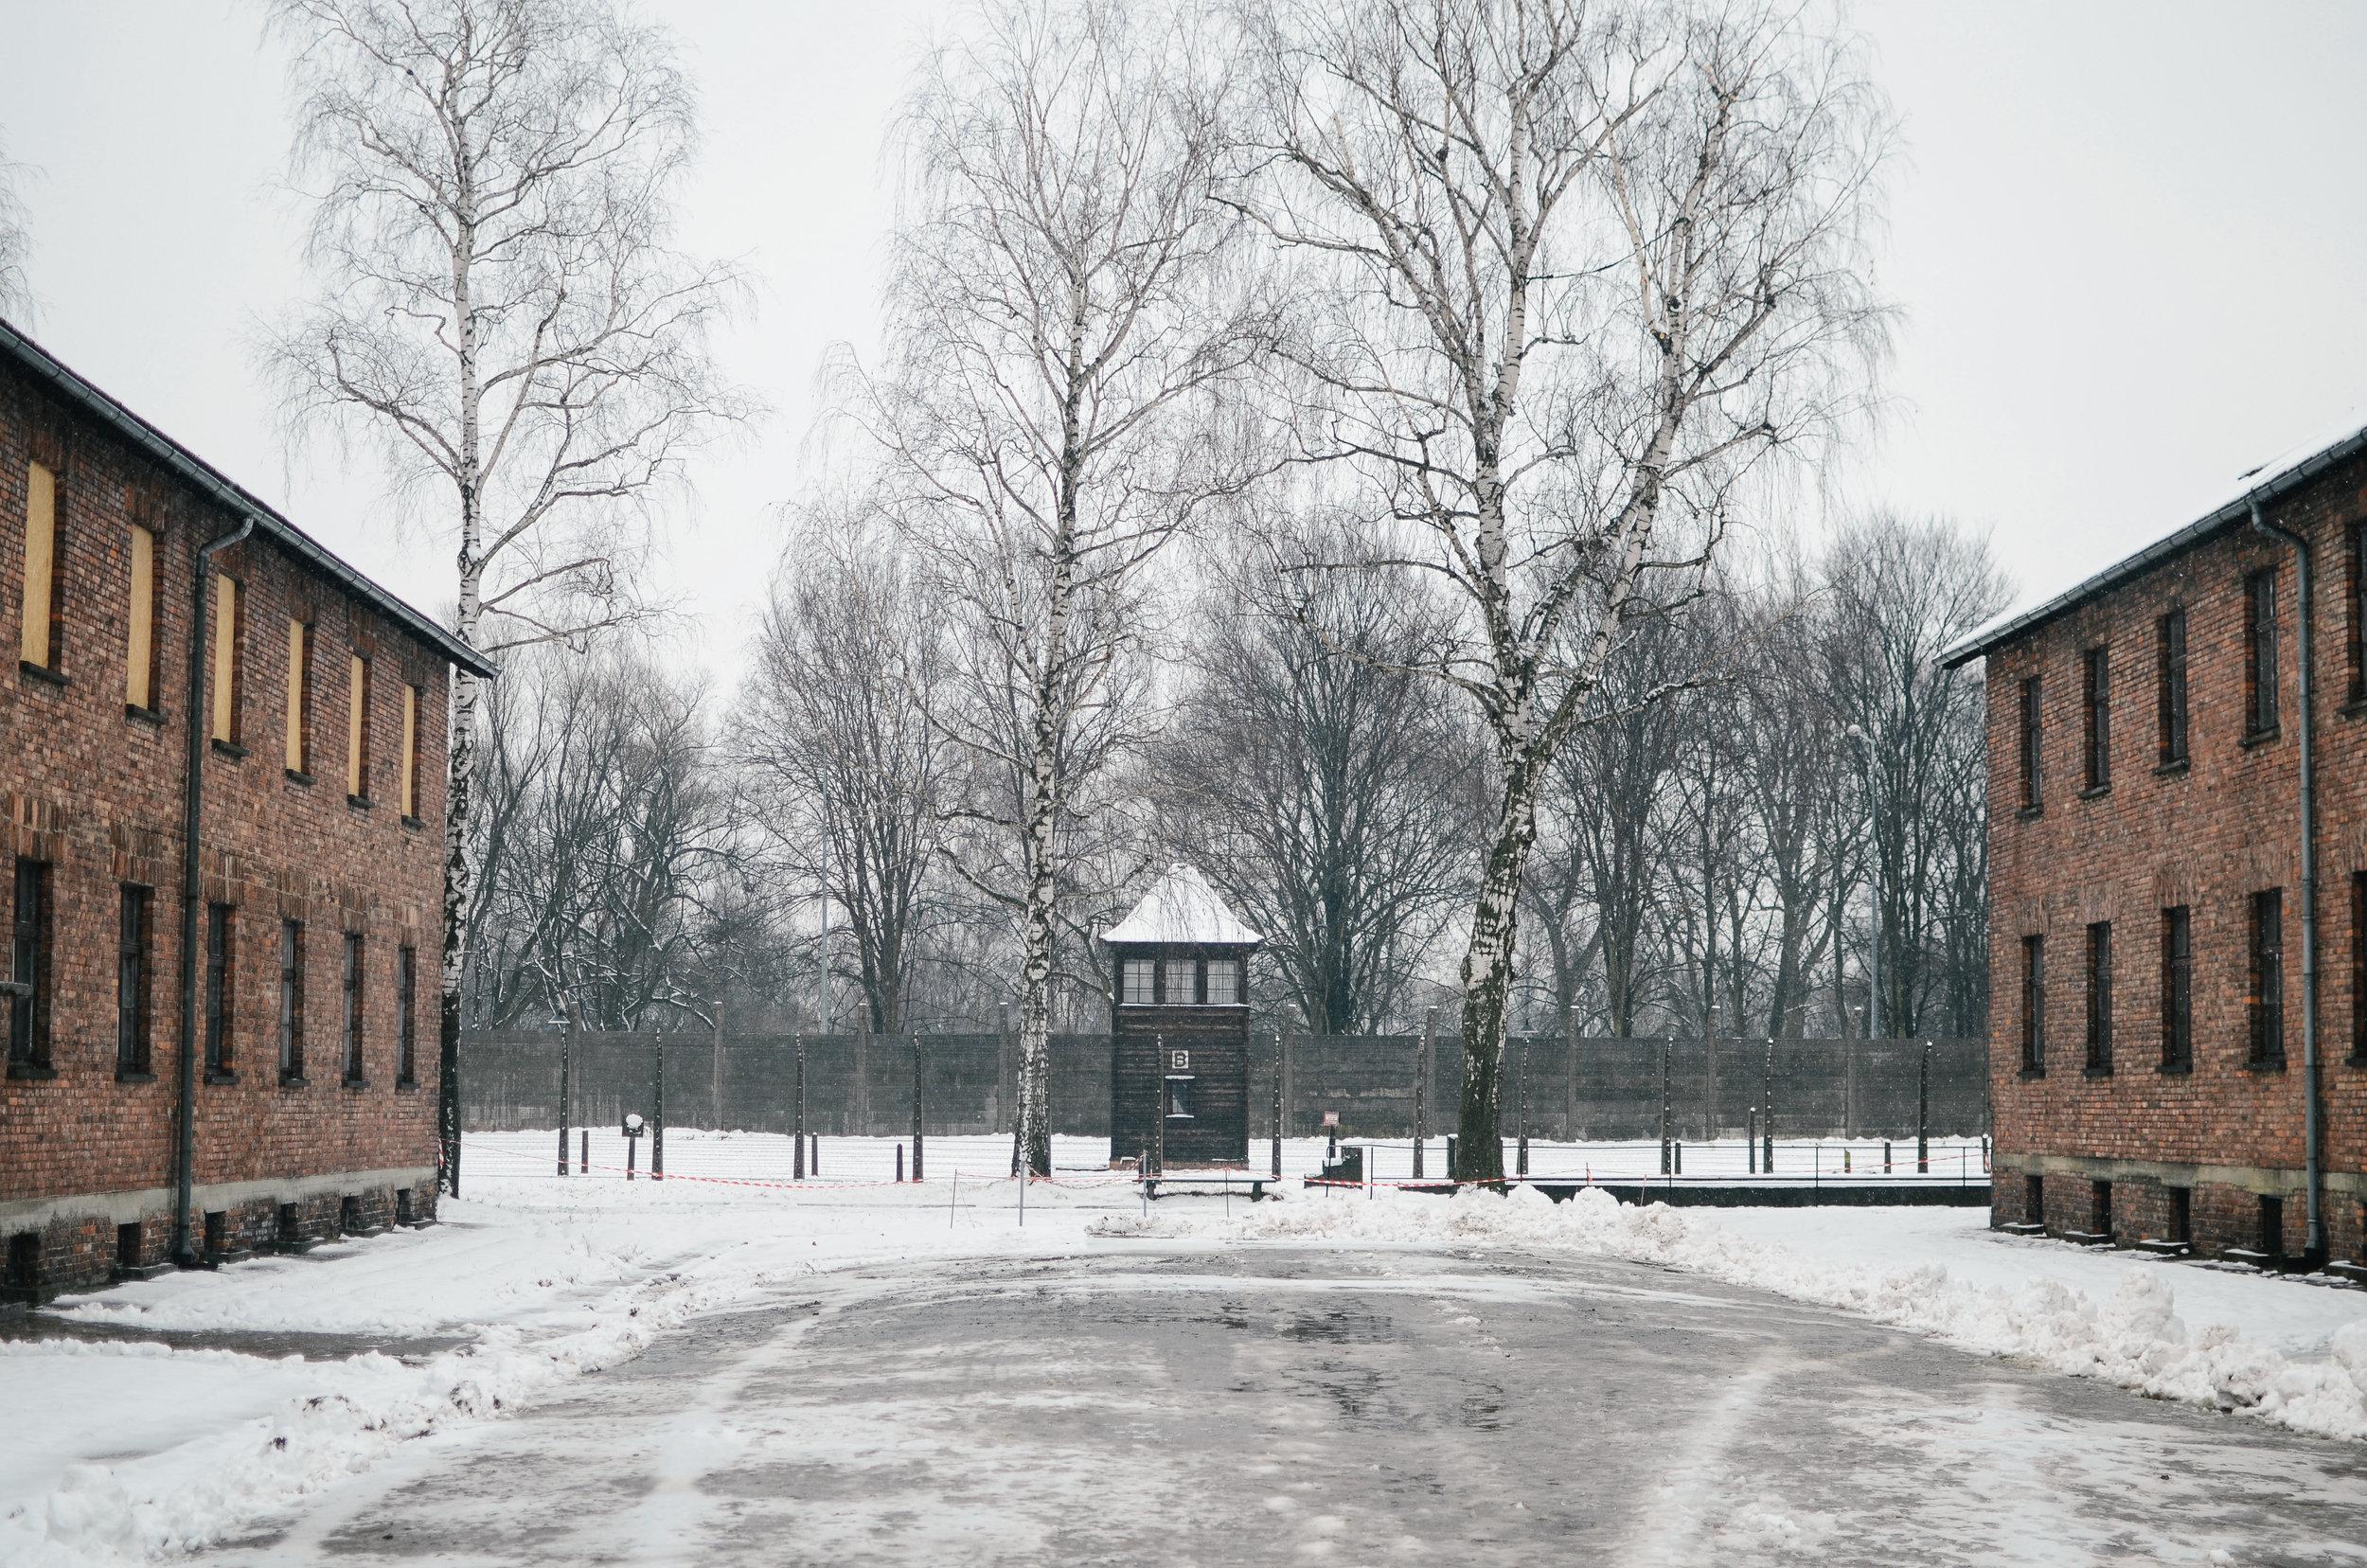 aushwitz-krakow-poland-travel-guide-lifeonpin_DSC_1017.jpg